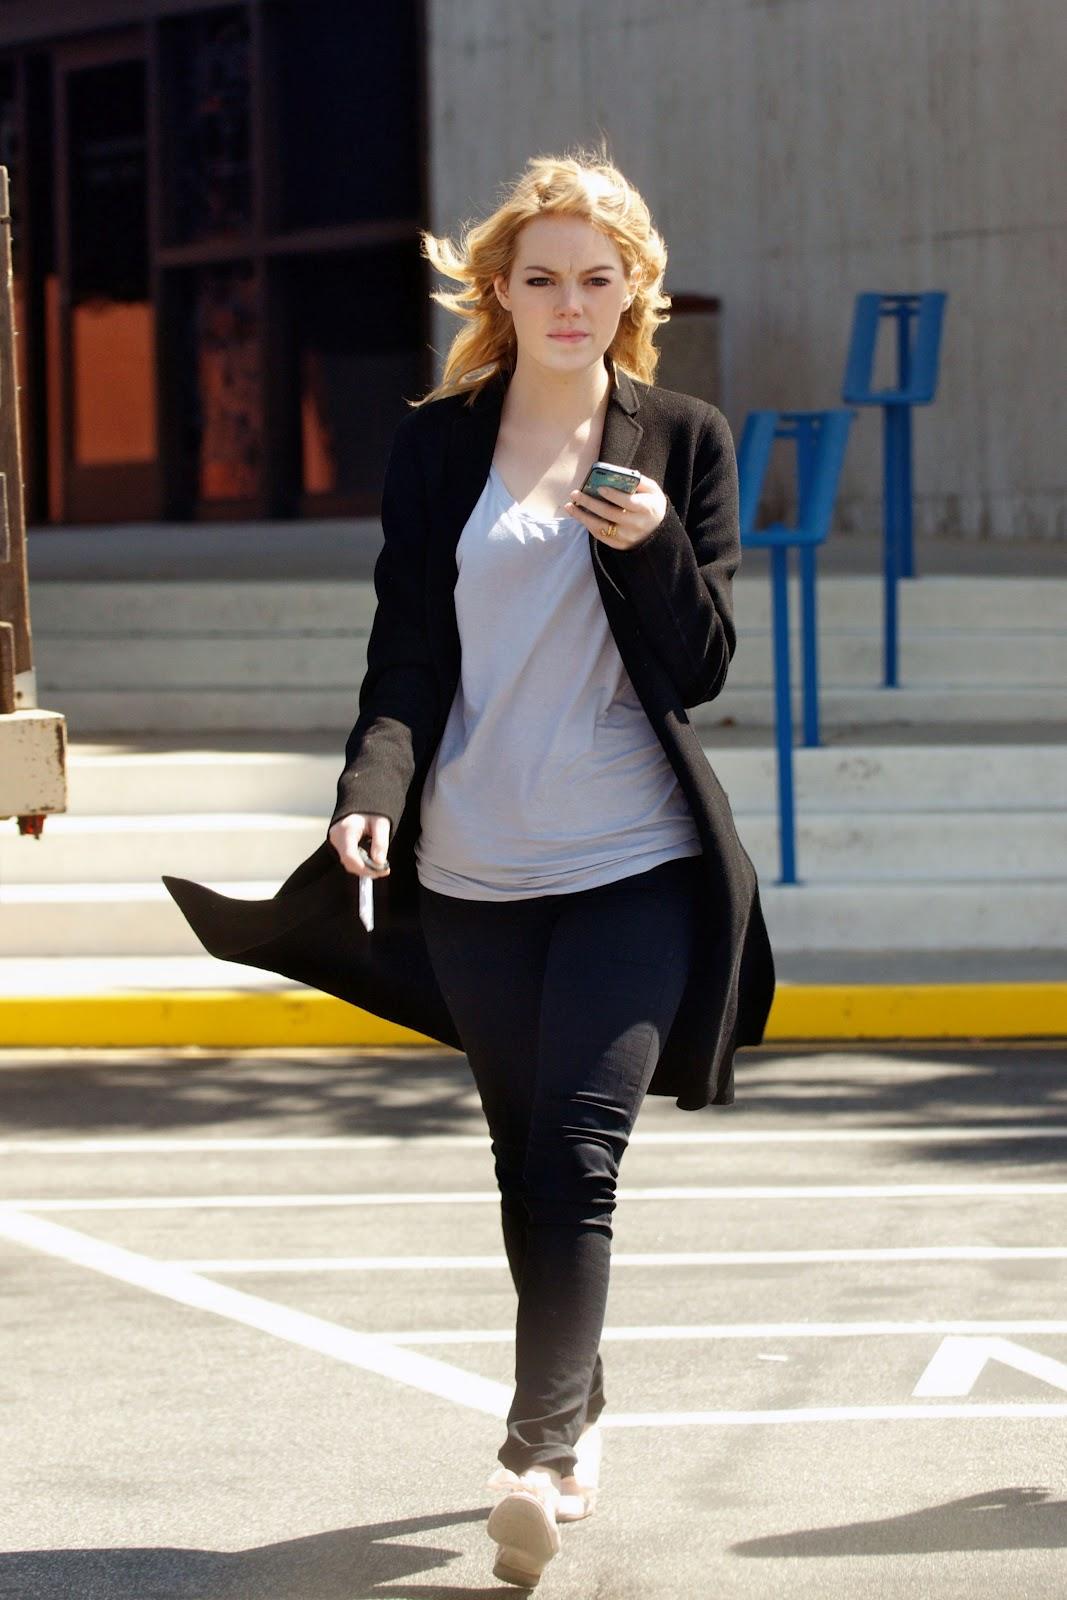 Andrew Garfield Wallpaper Iphone Emma Stone Emma Stone Street Style